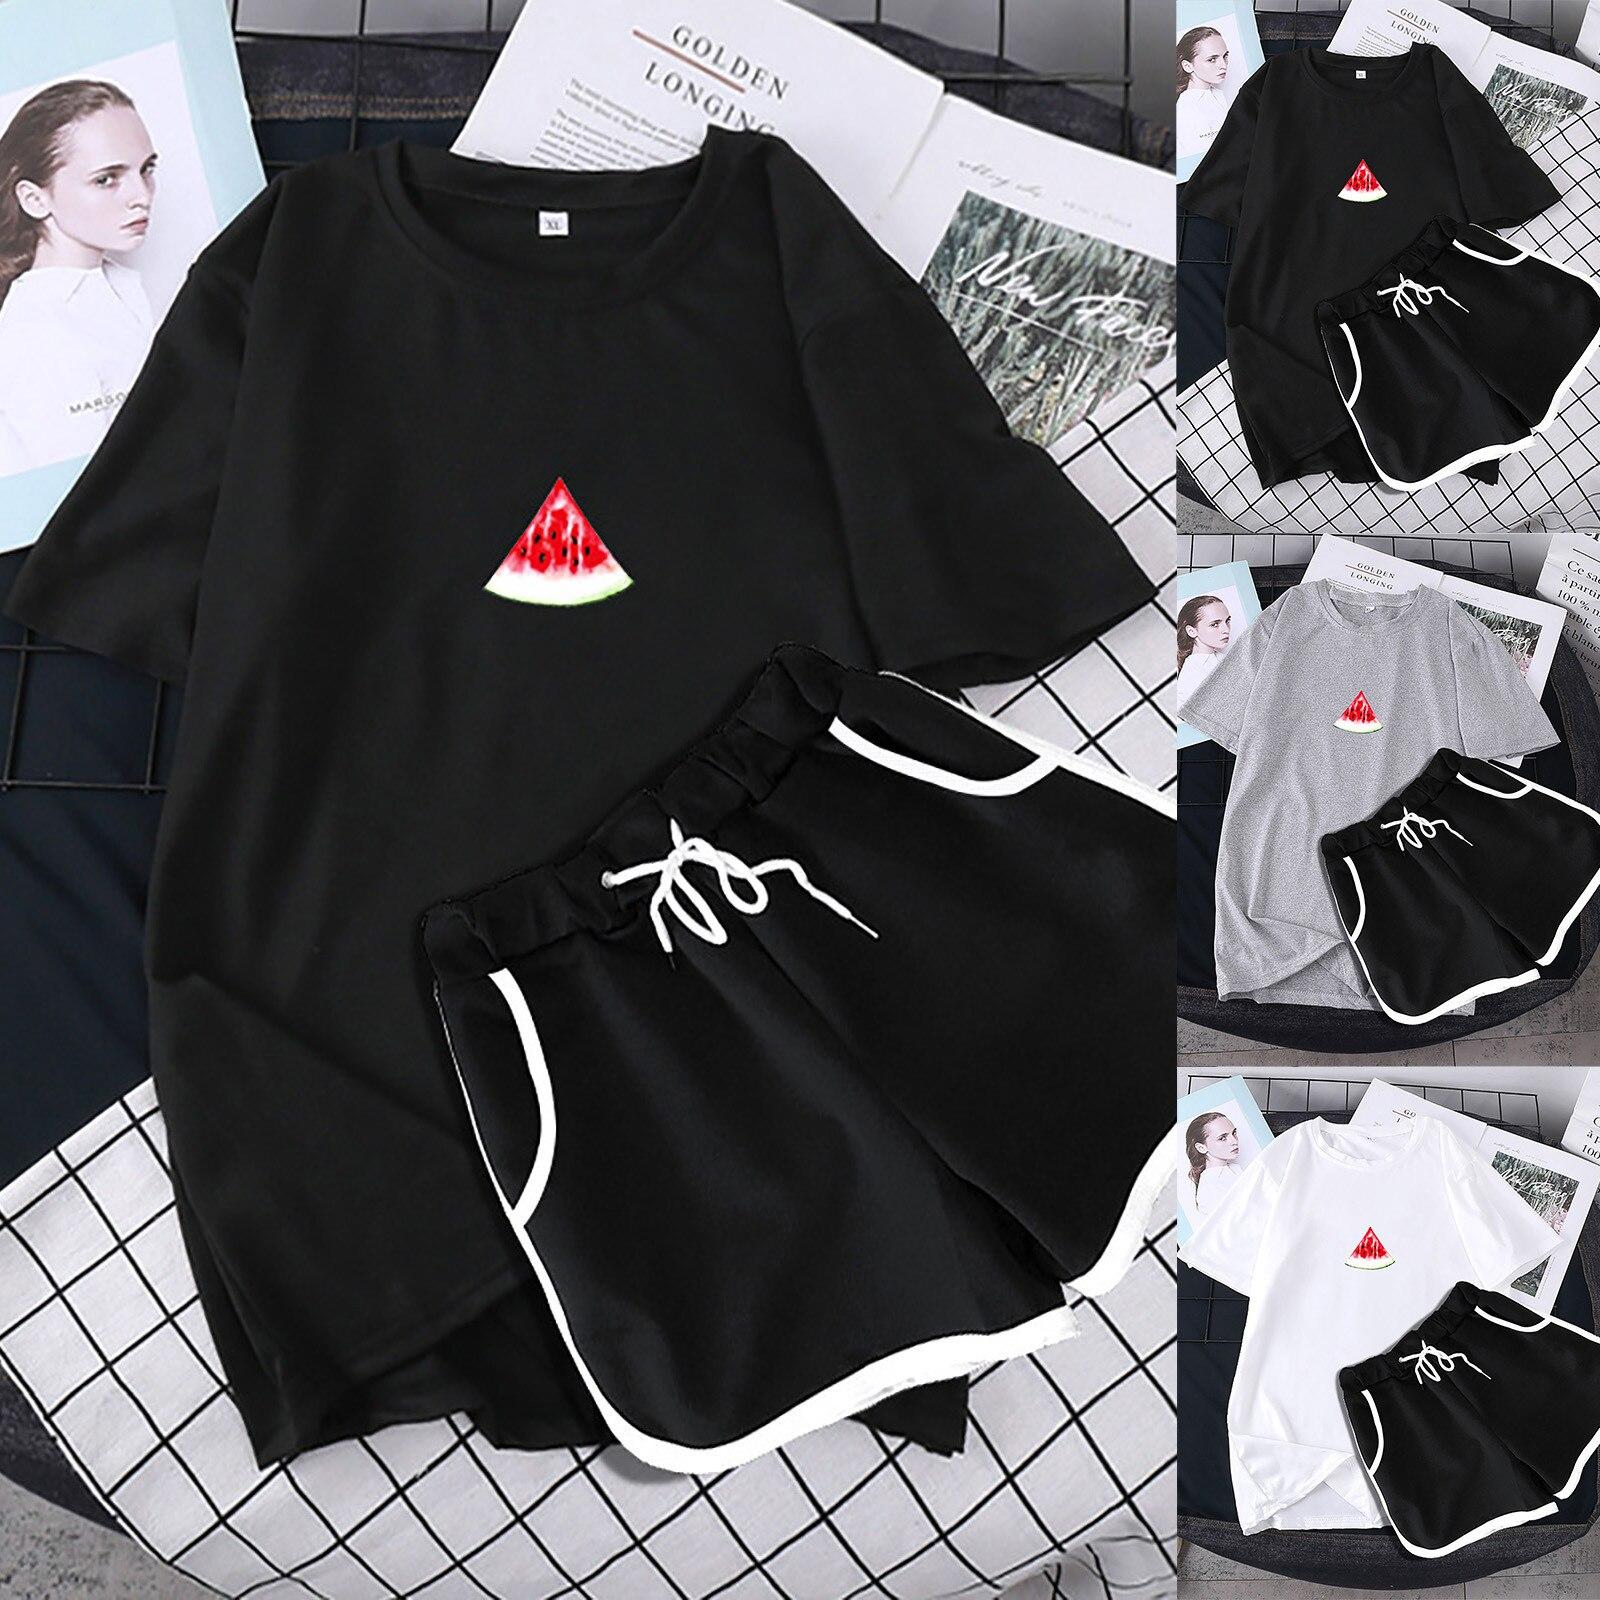 ISHOWTIENDA Women Two Piece Drop Sleeves Set Short Sleeve O-neck Paneled T Shirt Shorts Спортивные Костюмы Женс Women Set